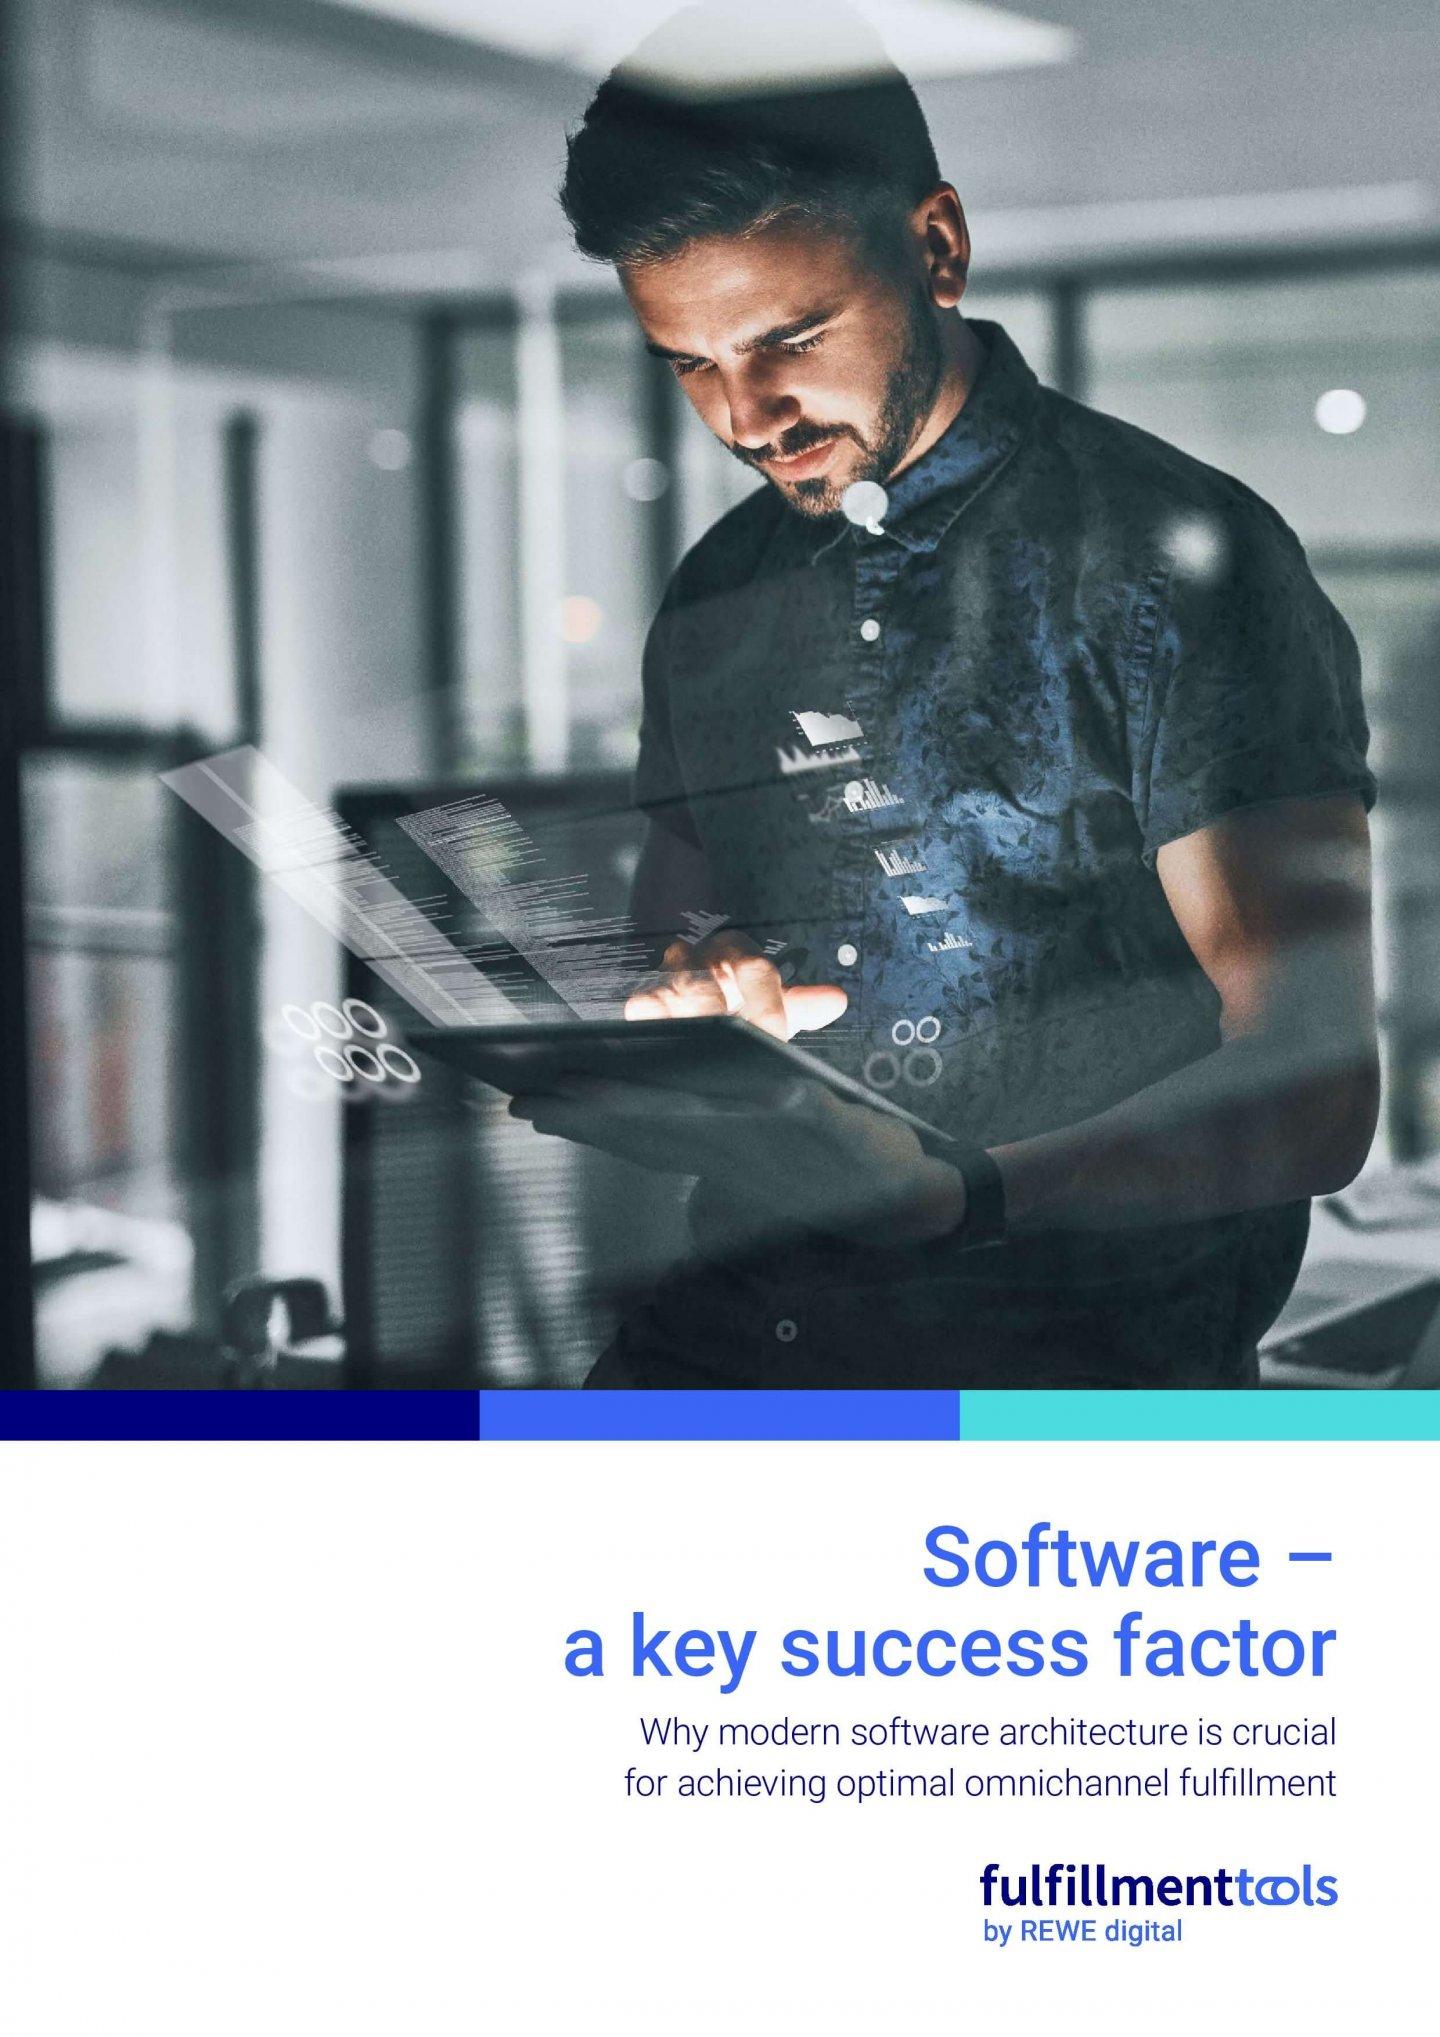 fulfillmenttools-whitepaper-software-a-key-success-factor